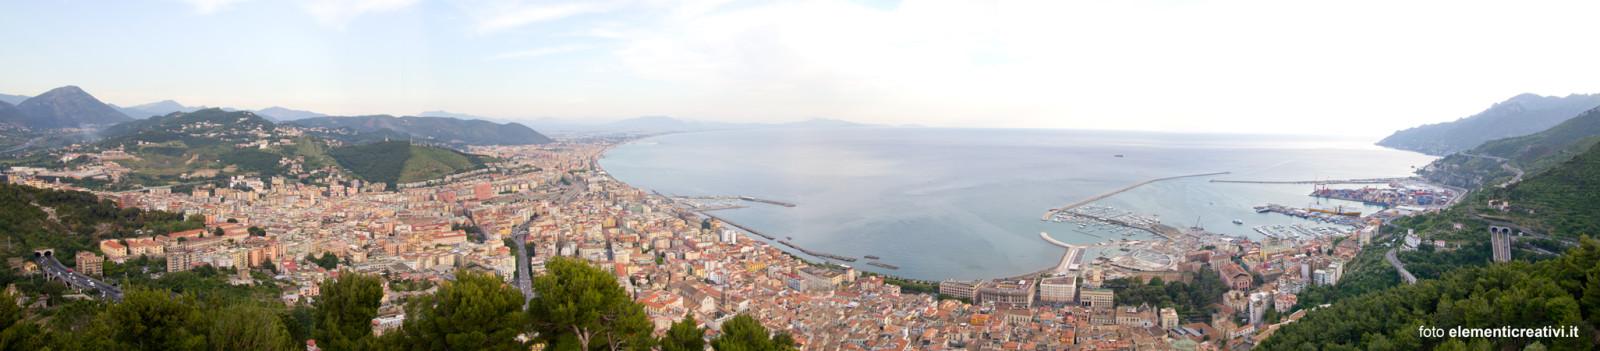 panoramica_salerno_confirma